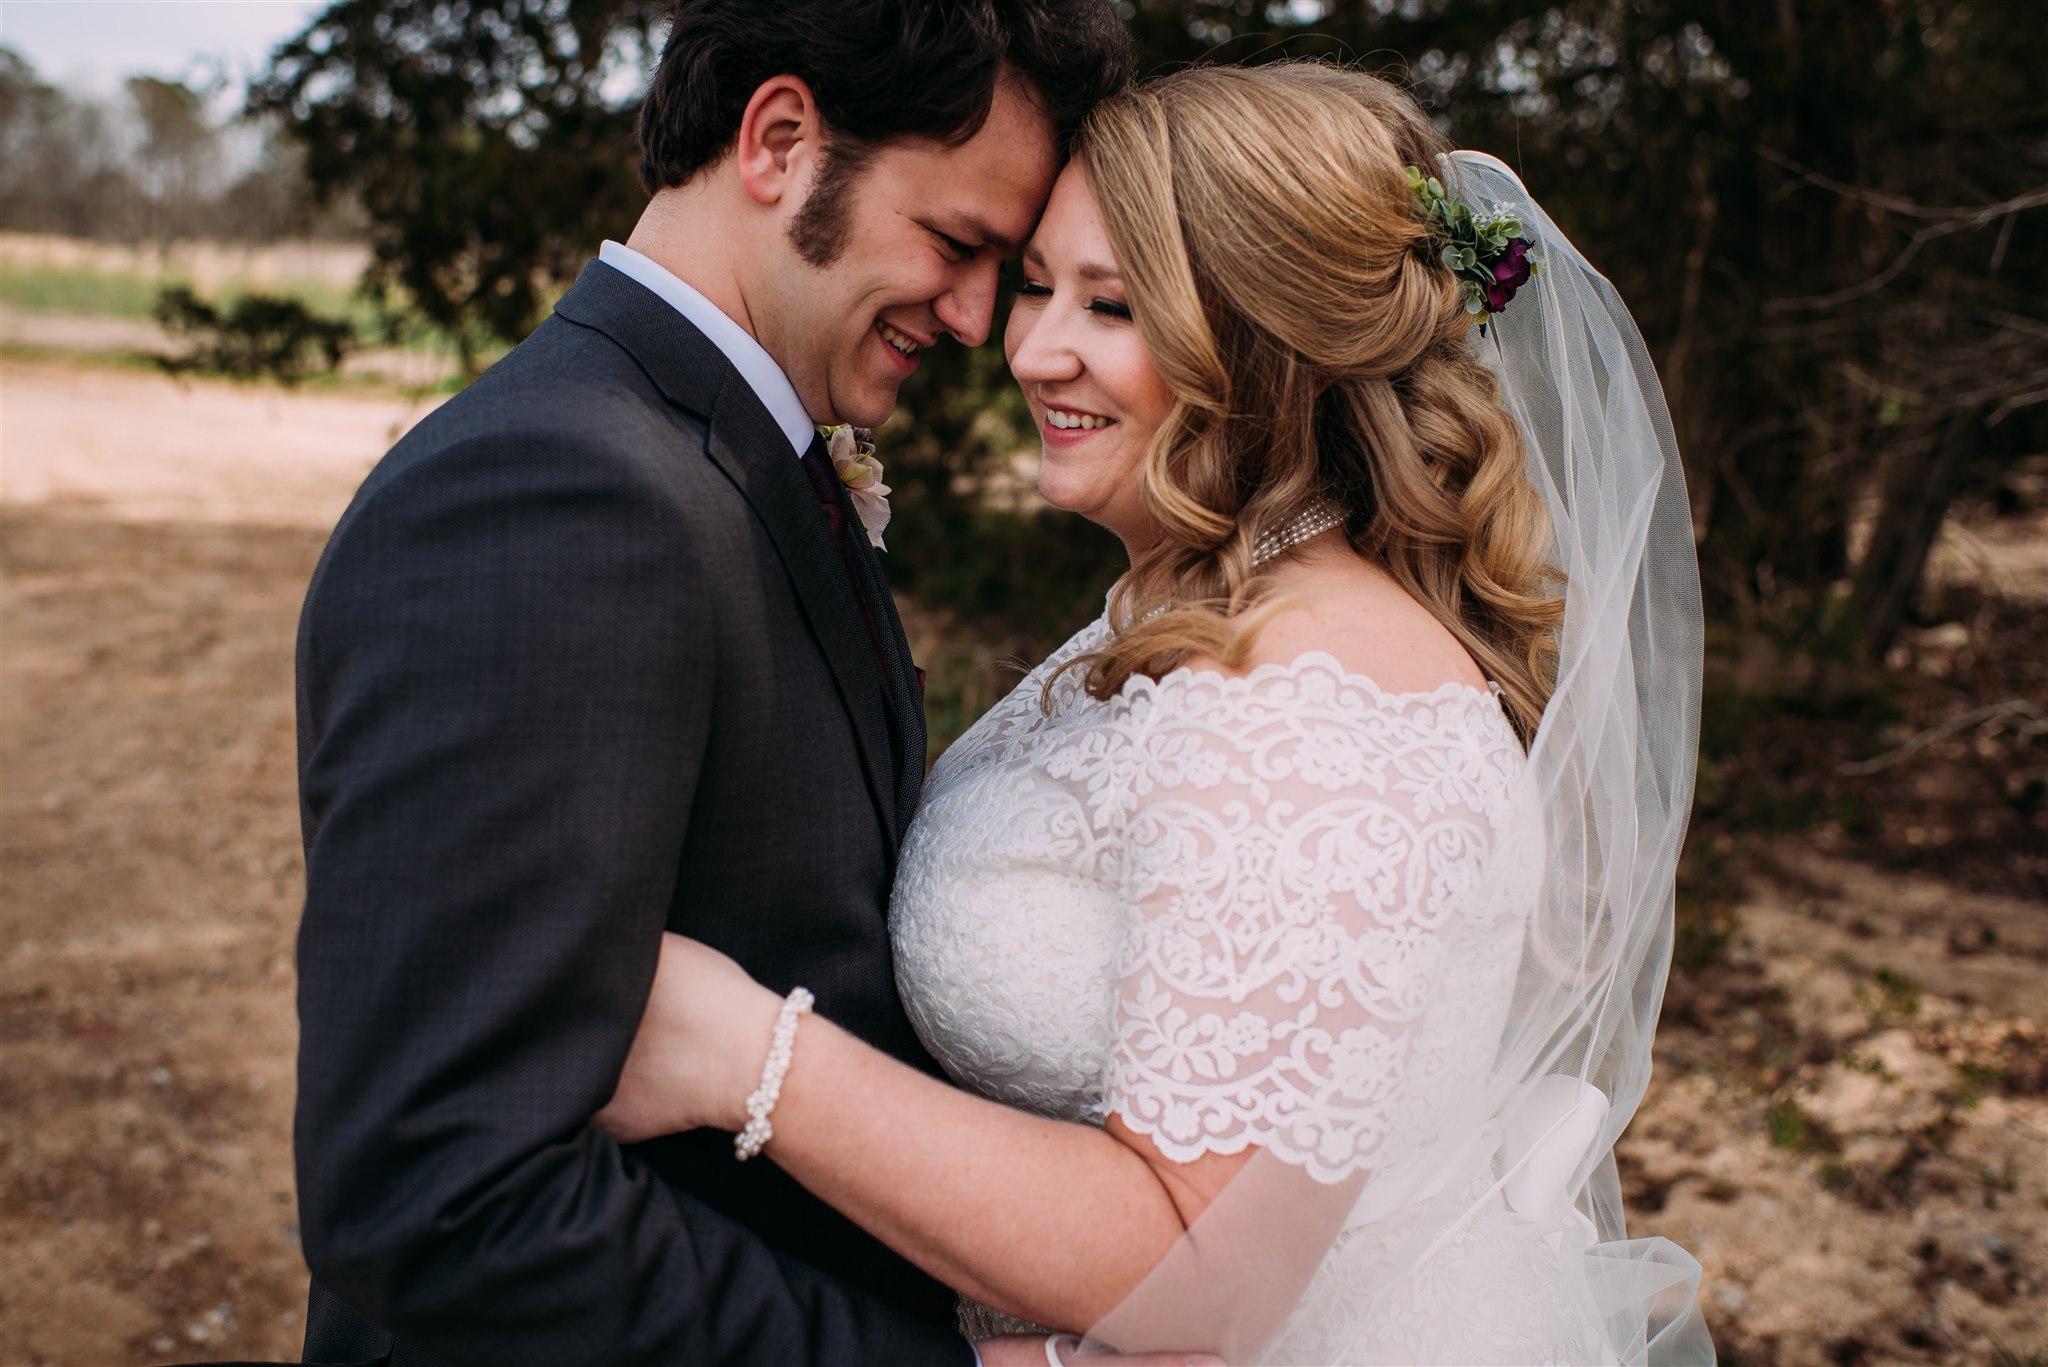 the meadows wedding - the meadows raleigh wedding - north carolina wedding photographer - raleigh wedding photographer - durham wedding photographer